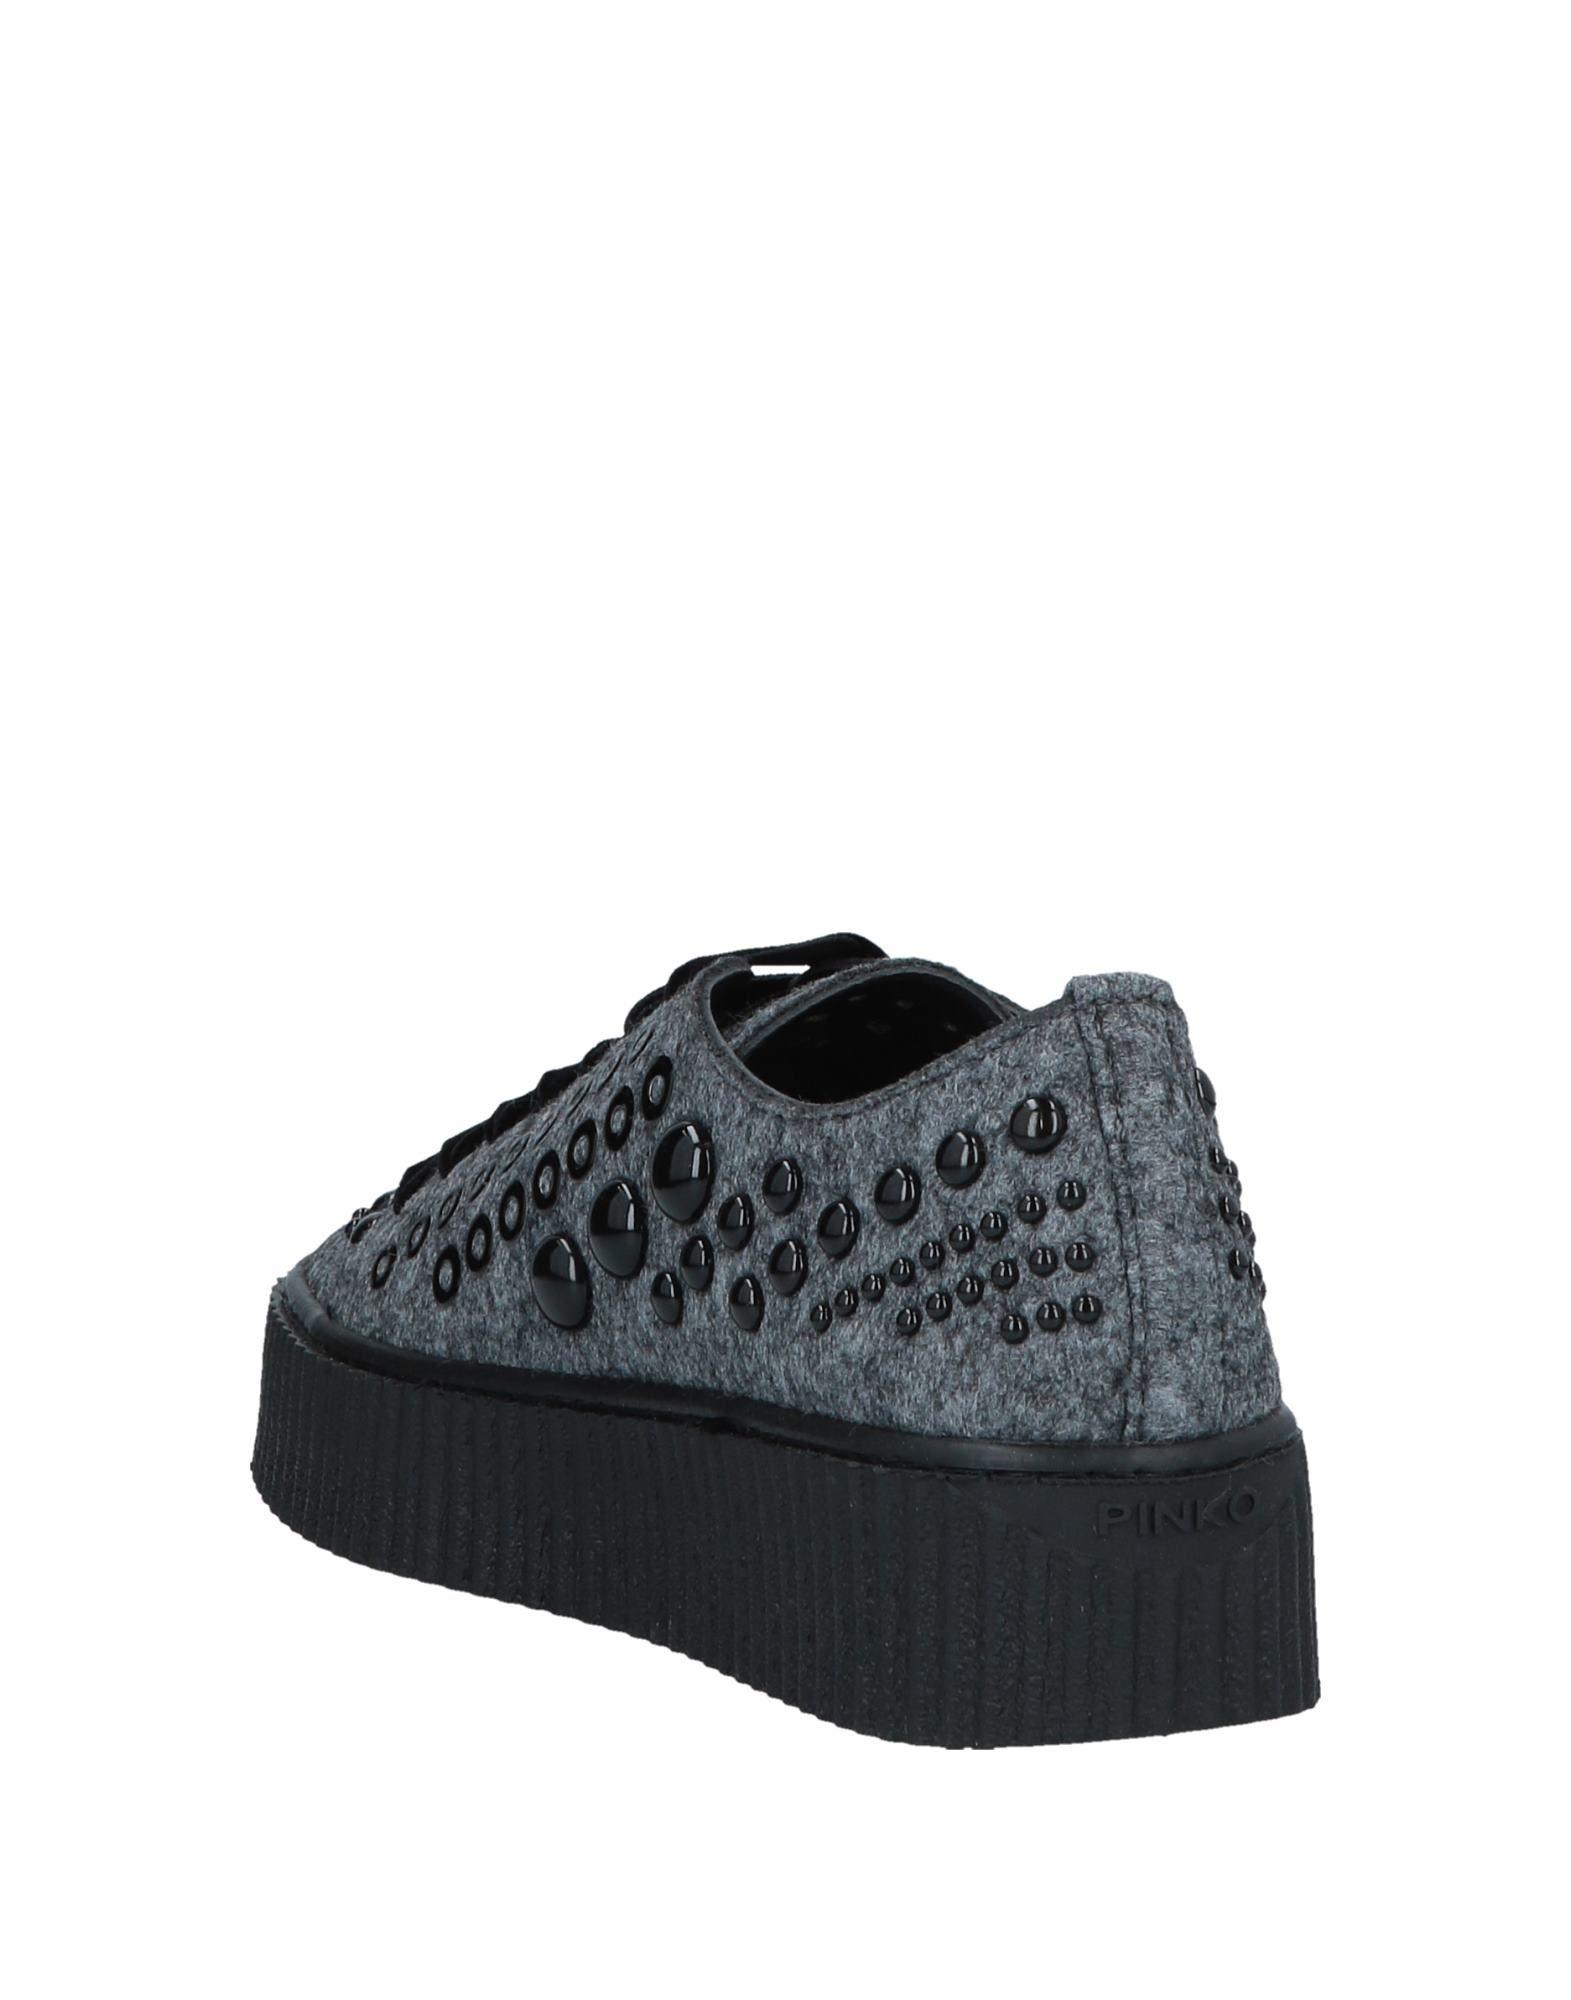 Pinko Grey Studded Sneakers